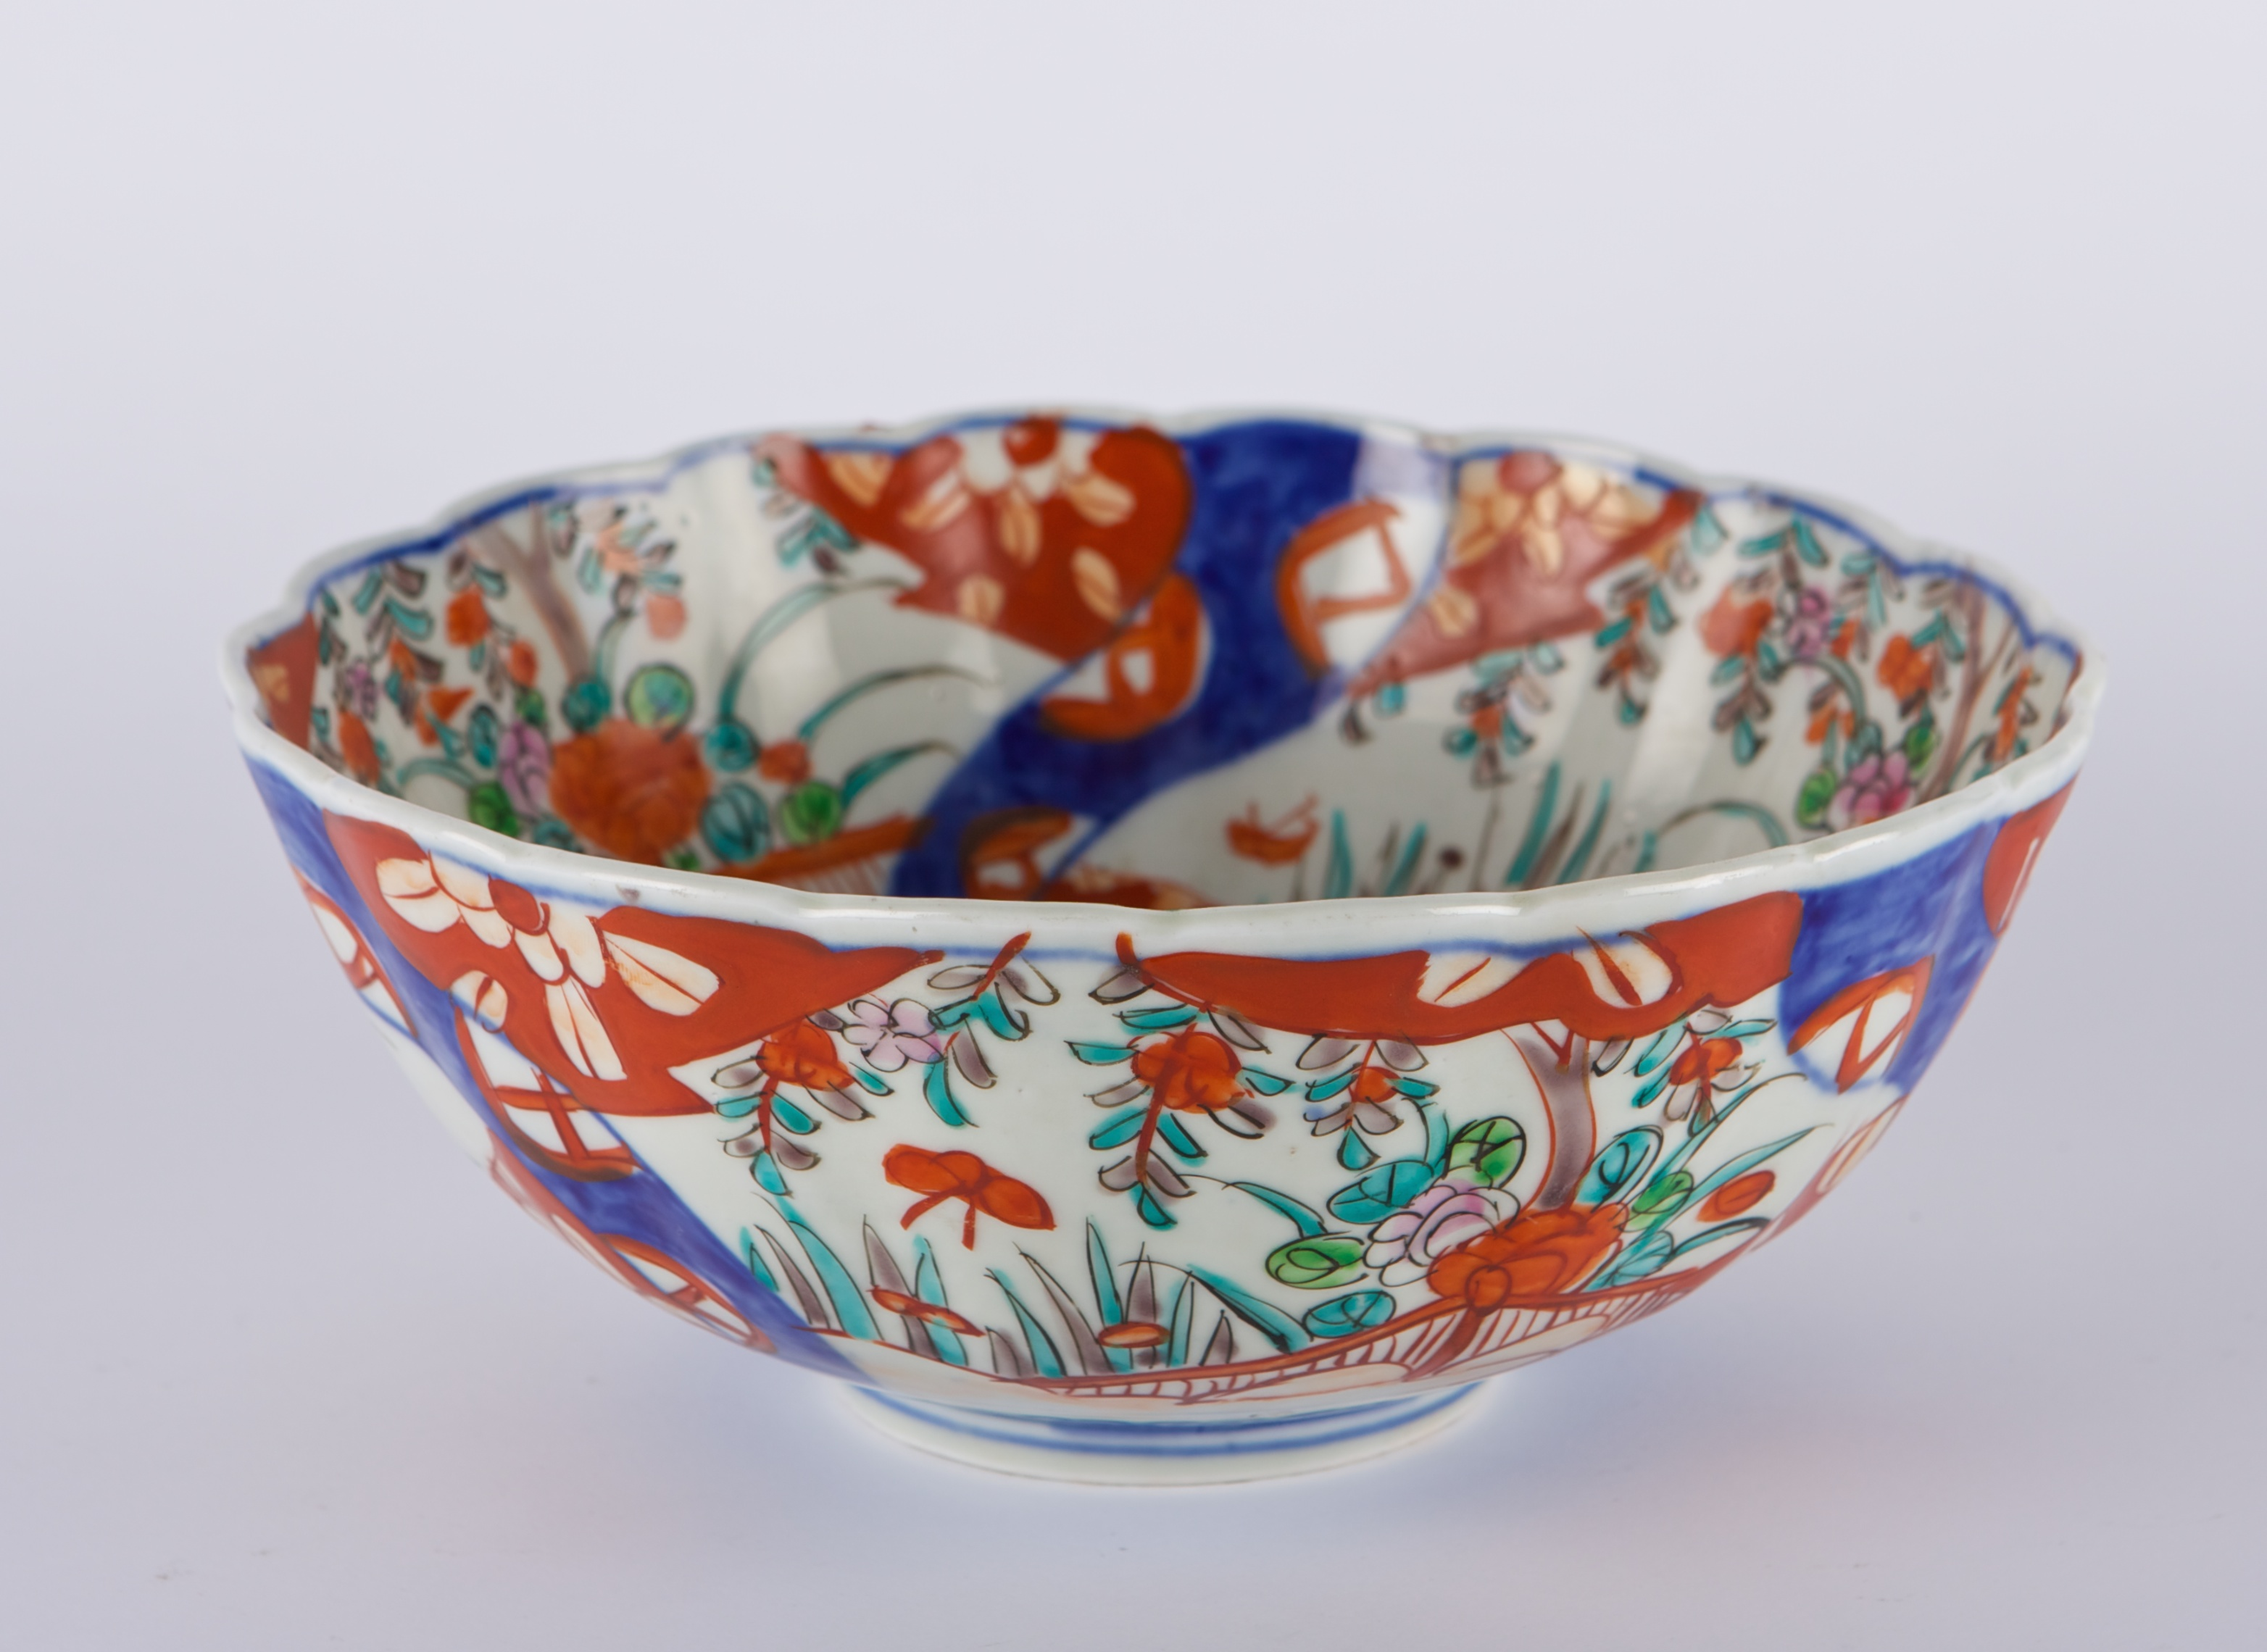 A Japanese Imari bowl, circa 1900.